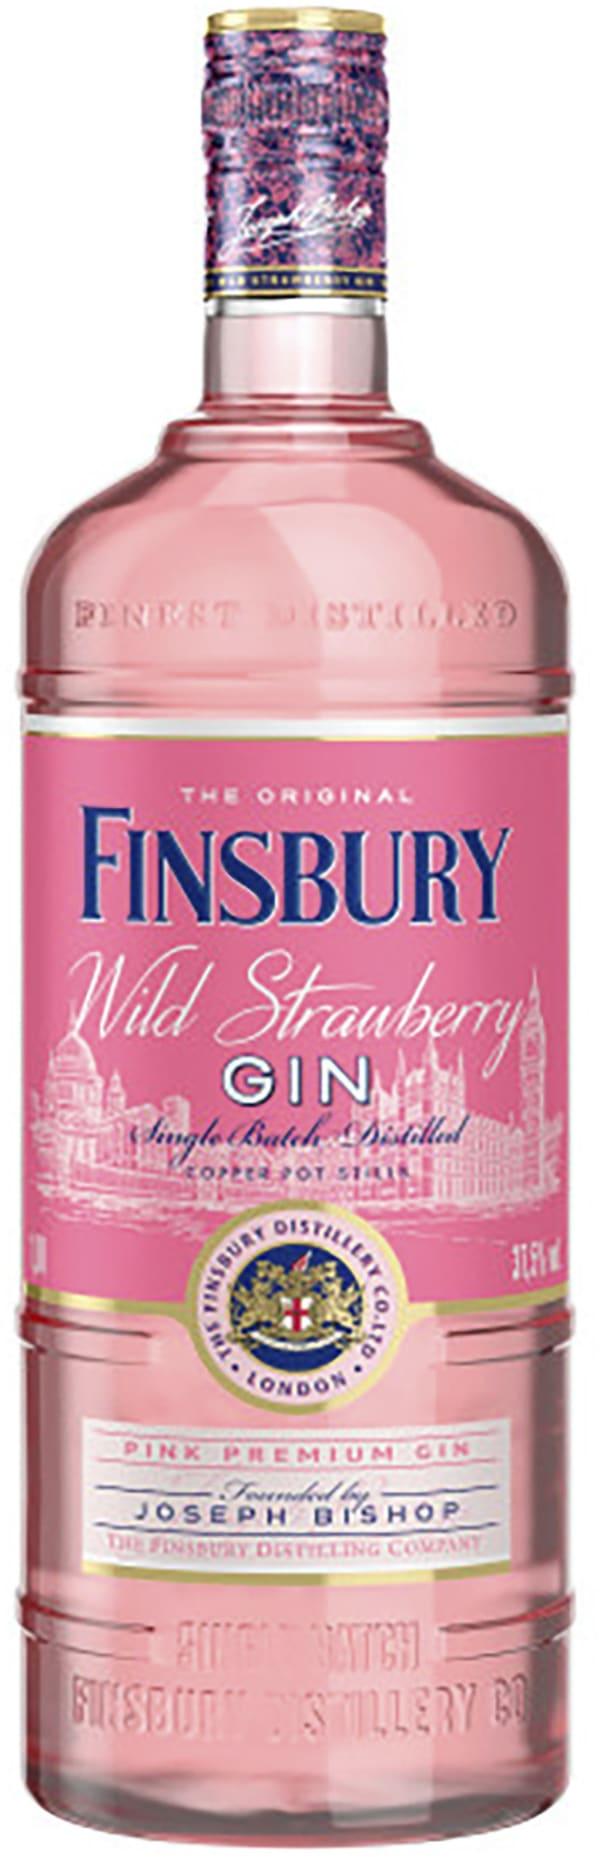 Finsbury Wild Strawberry